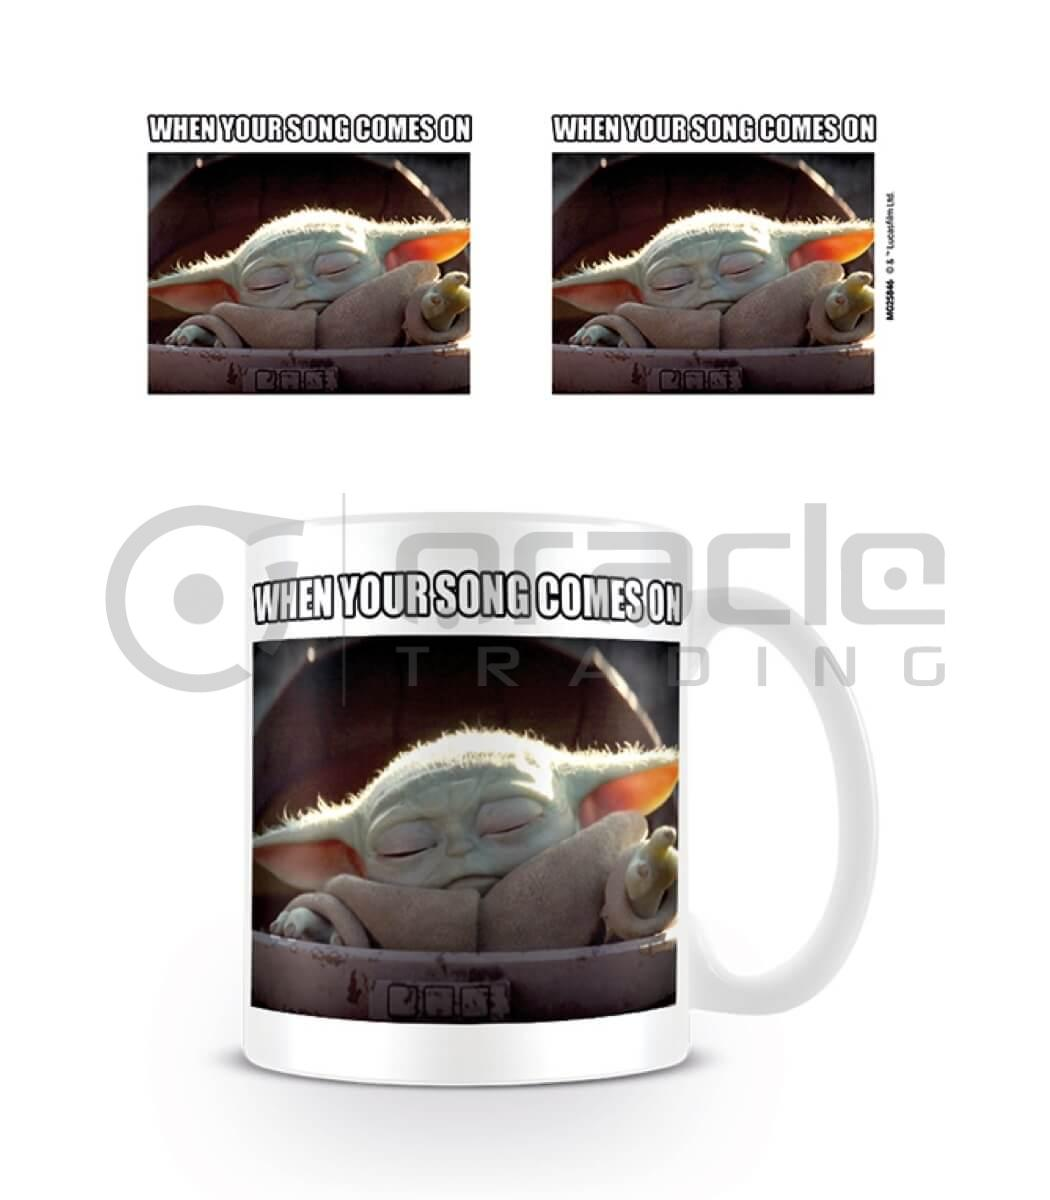 Star Wars: The Mandalorian Song Meme Mug